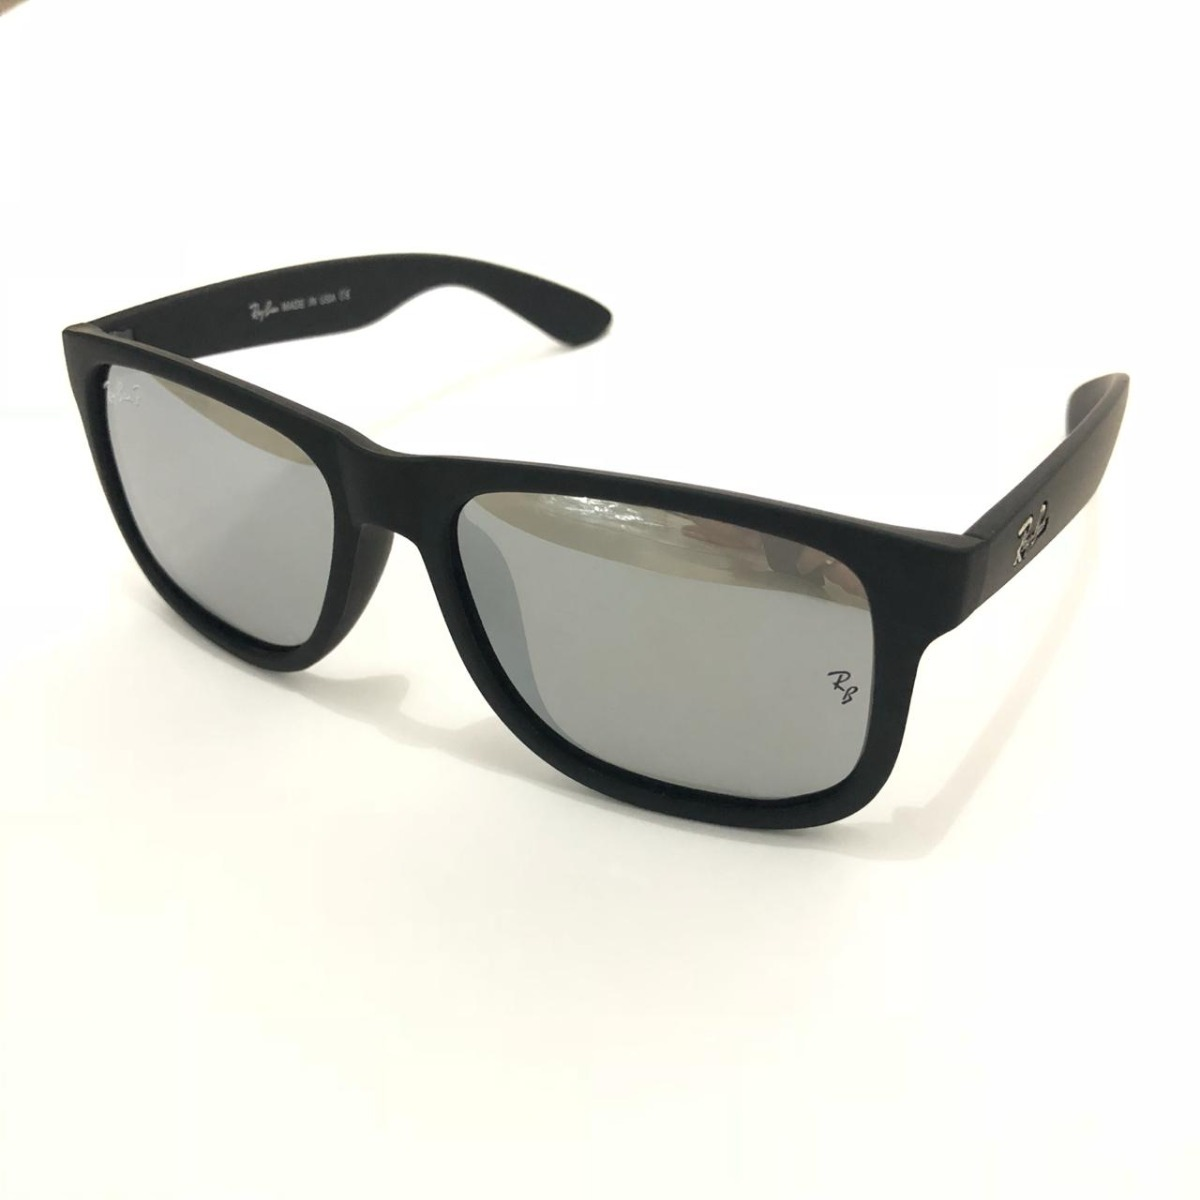 77fc01ecf16ef Óculos De Sol Masculino Justin Quadrado Polarizado Top - R  49,99 em ...